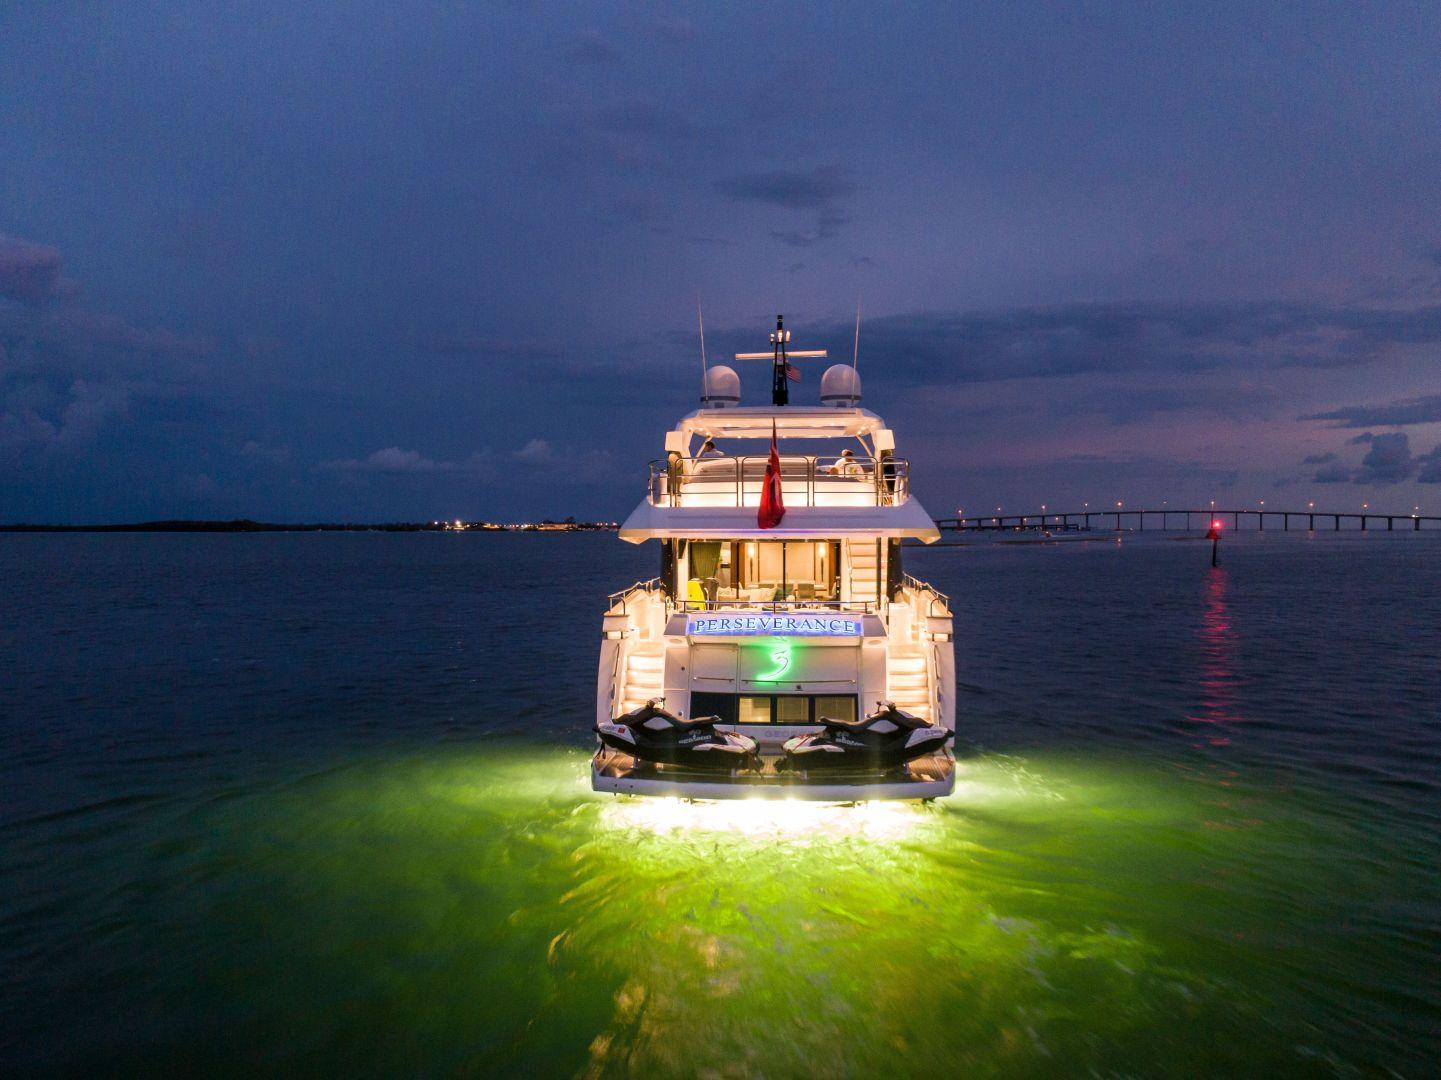 Sunseeker-95 Yacht 2017-Perseverance 3 Ft Lauderdale-Florida-United States-1400071   Thumbnail